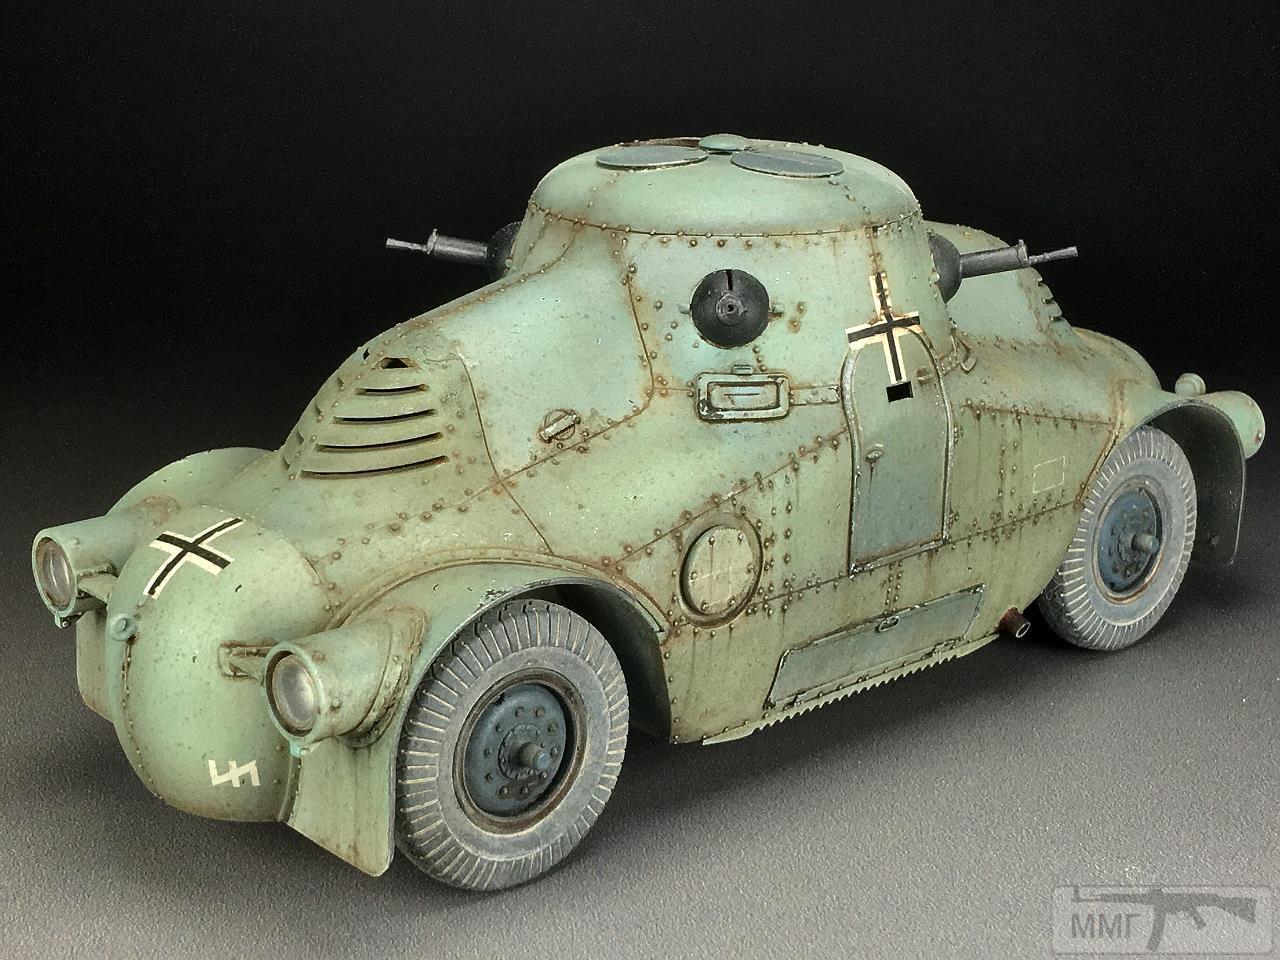 37974 - Модели бронетехники